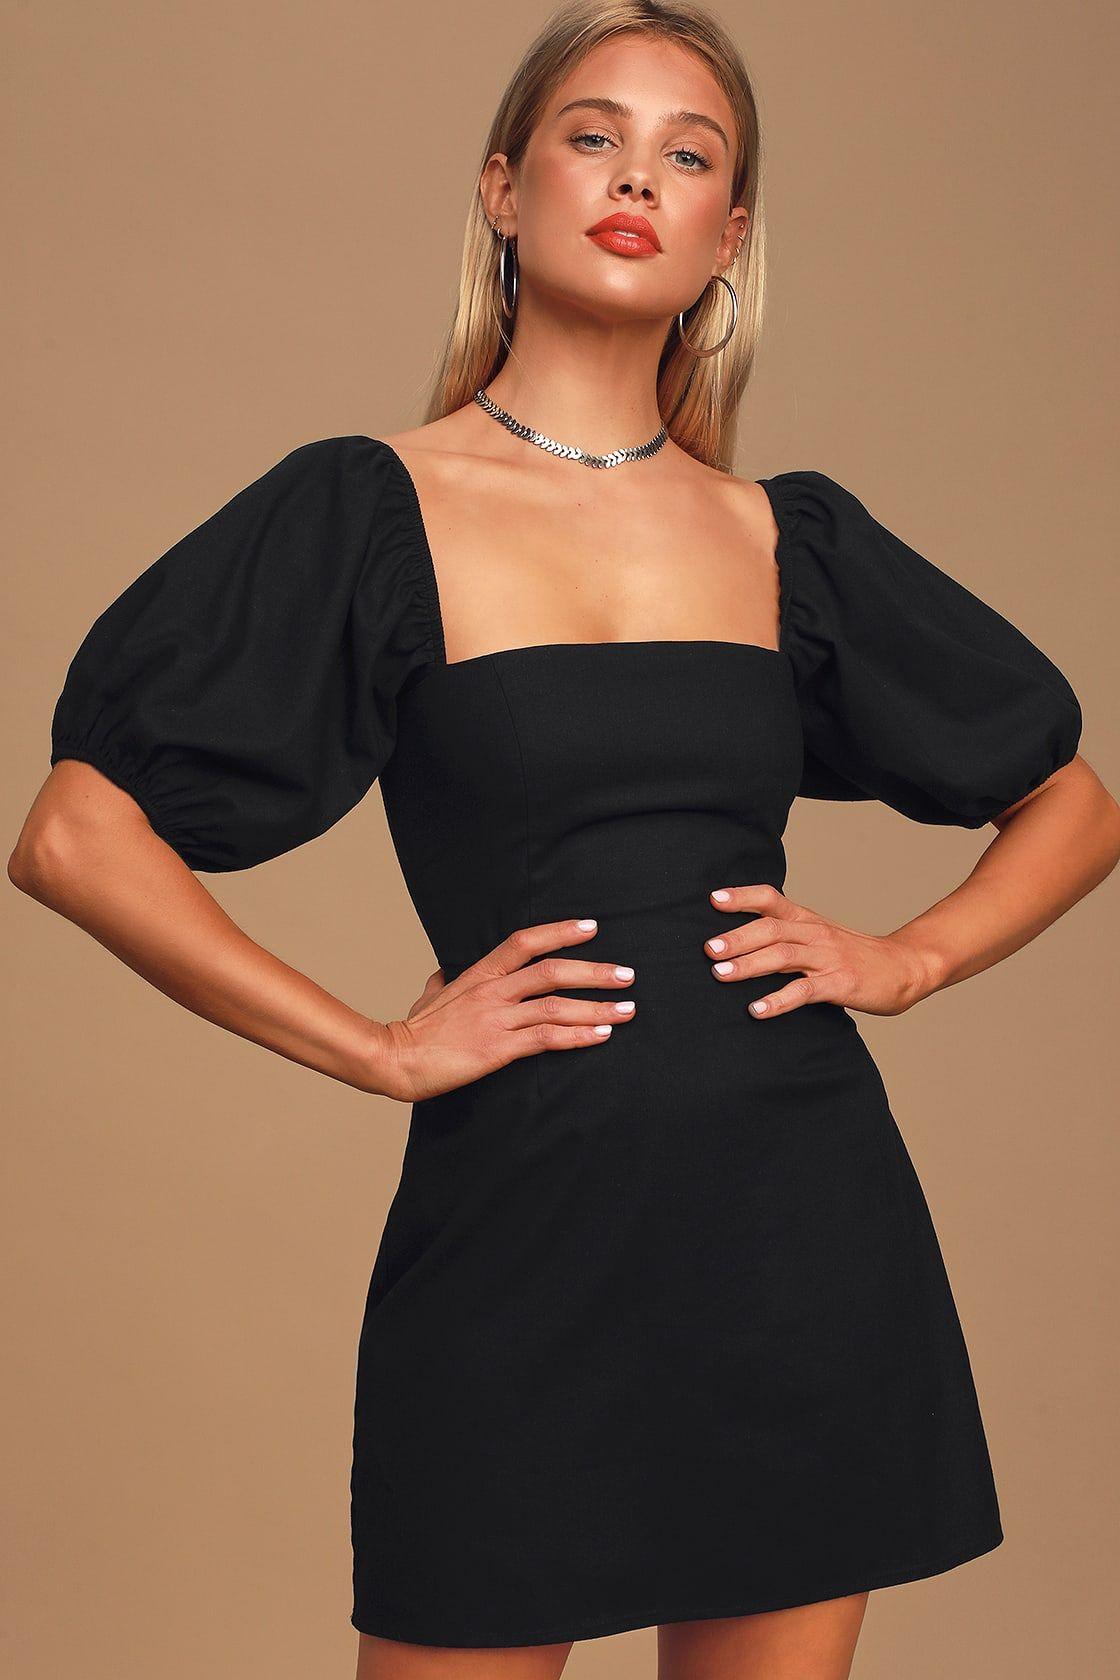 Square To Next Black Puff Sleeve Mini Dress Mini Dress With Sleeves Mini Dress Fashion Outfits [ 1680 x 1120 Pixel ]